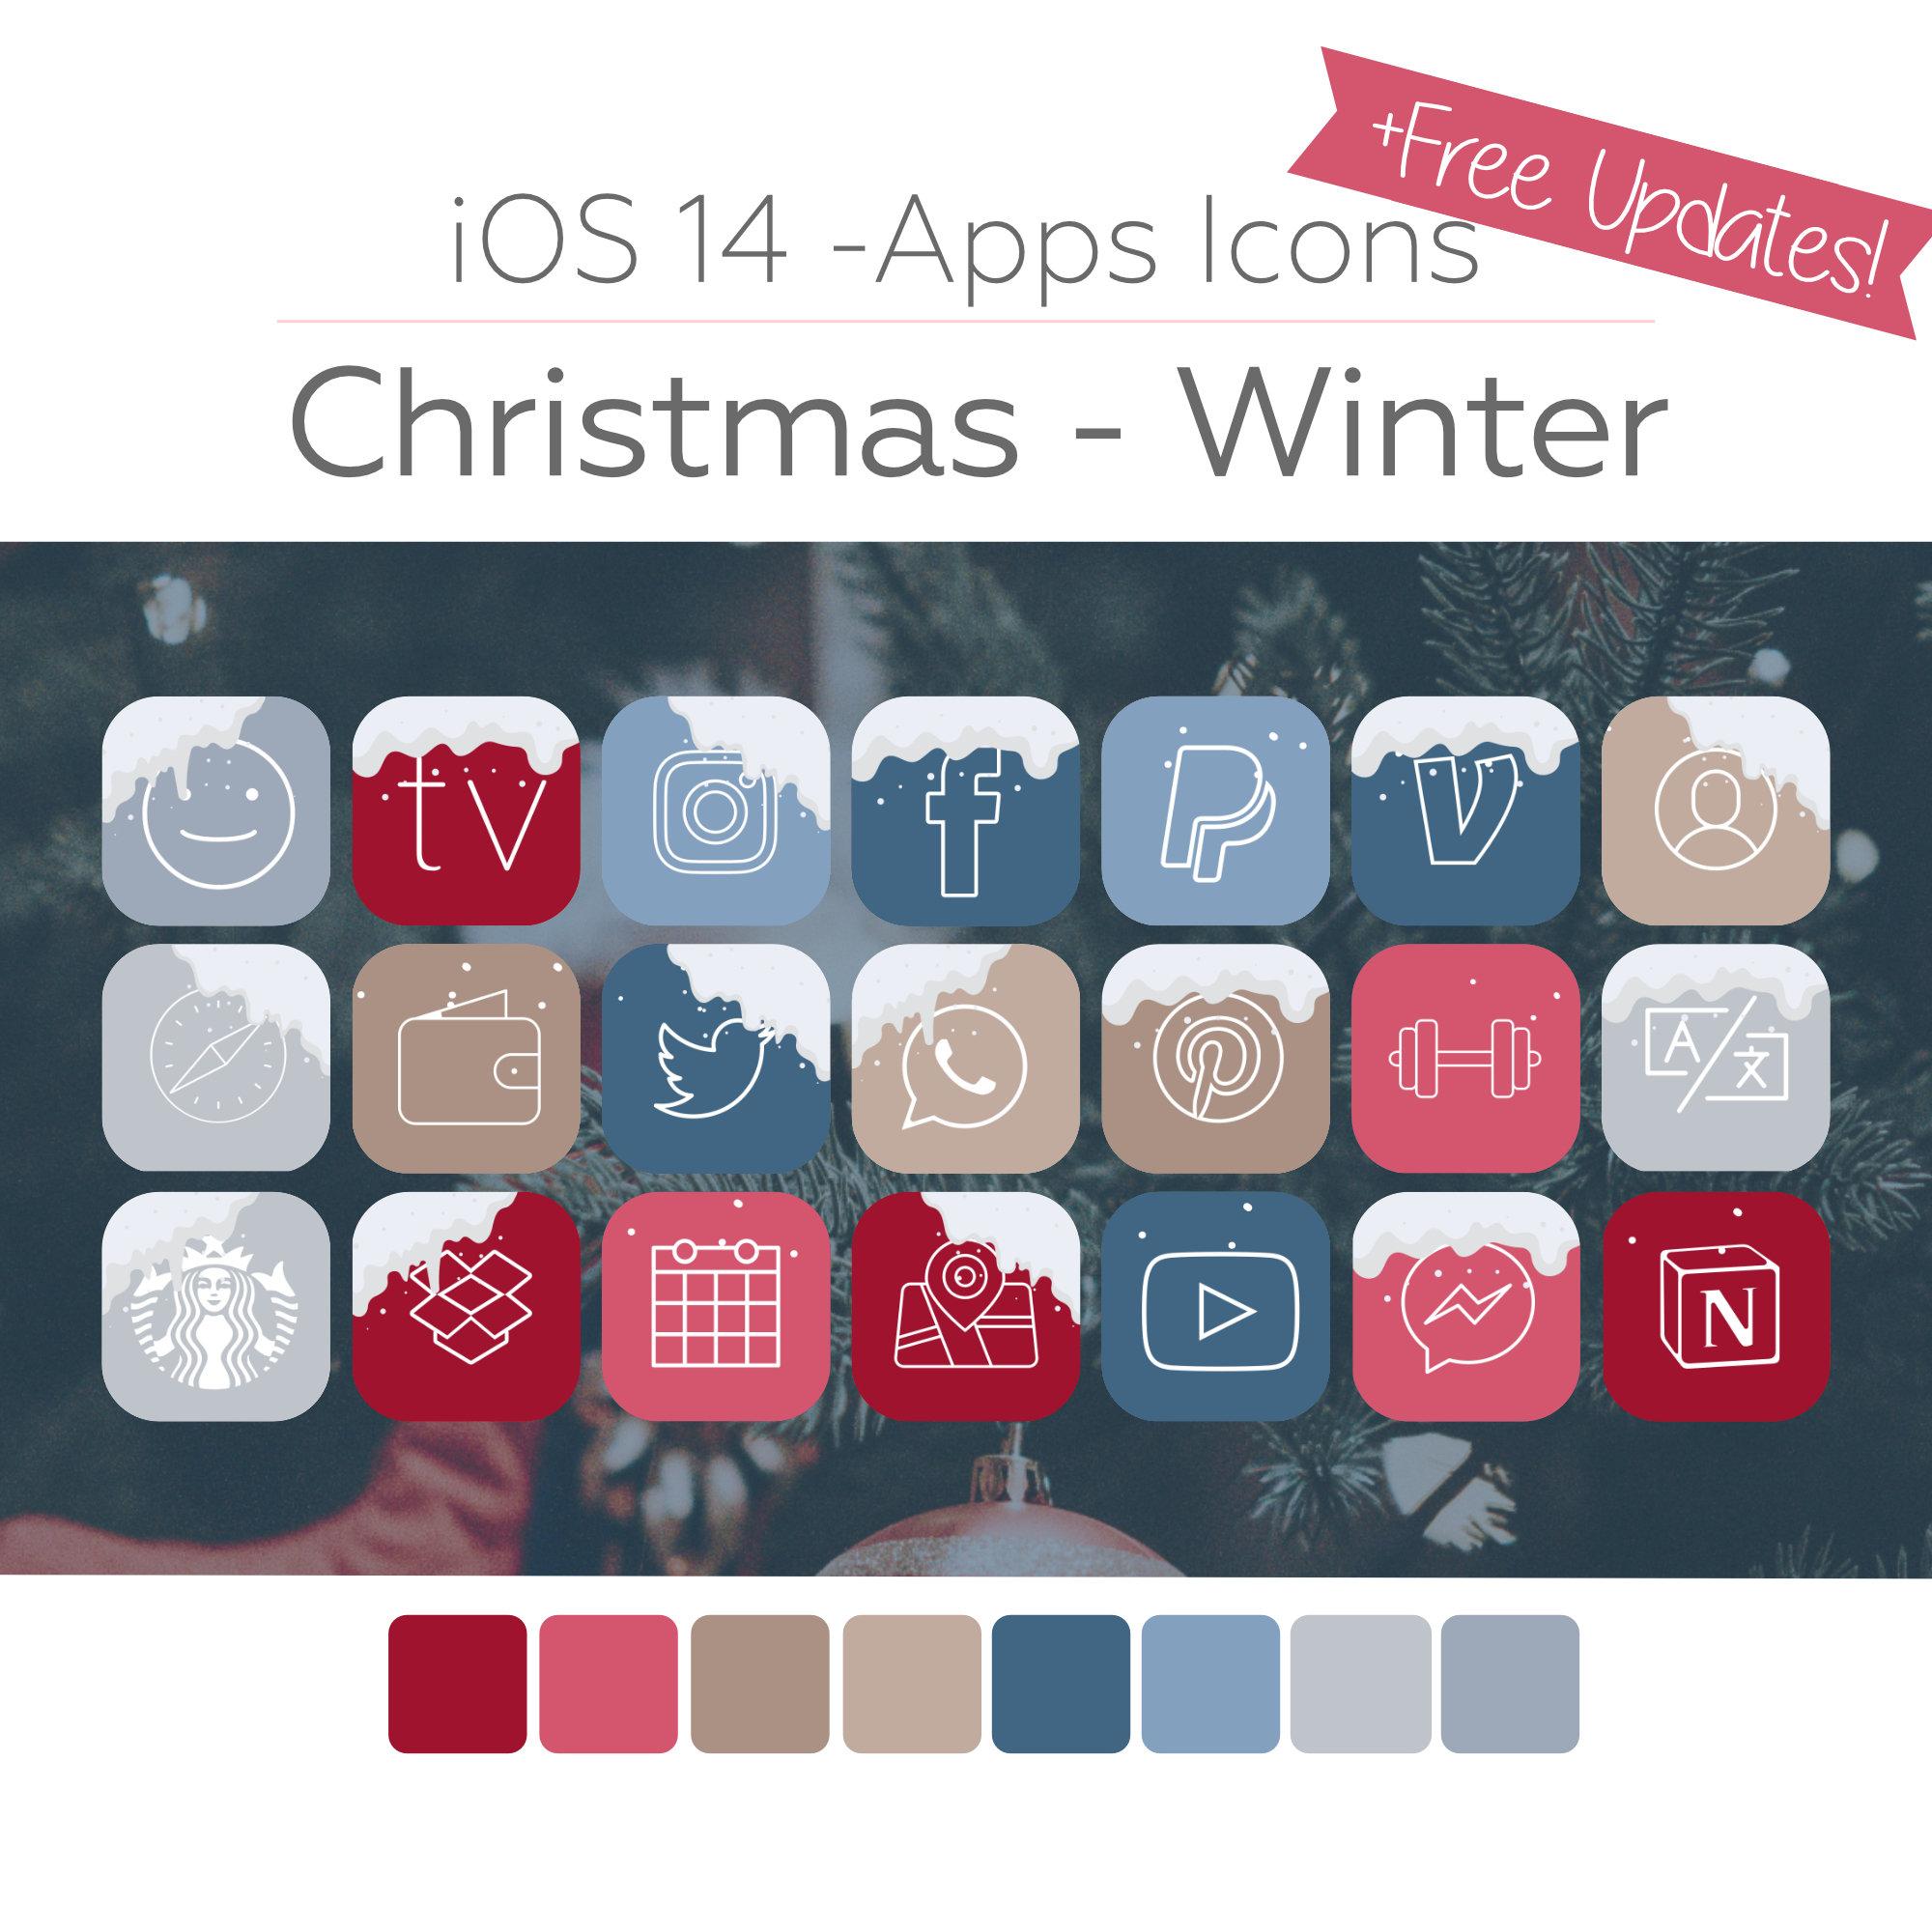 Winter Ios Icons Aesthetic Iphone Home Screen Digisparkles